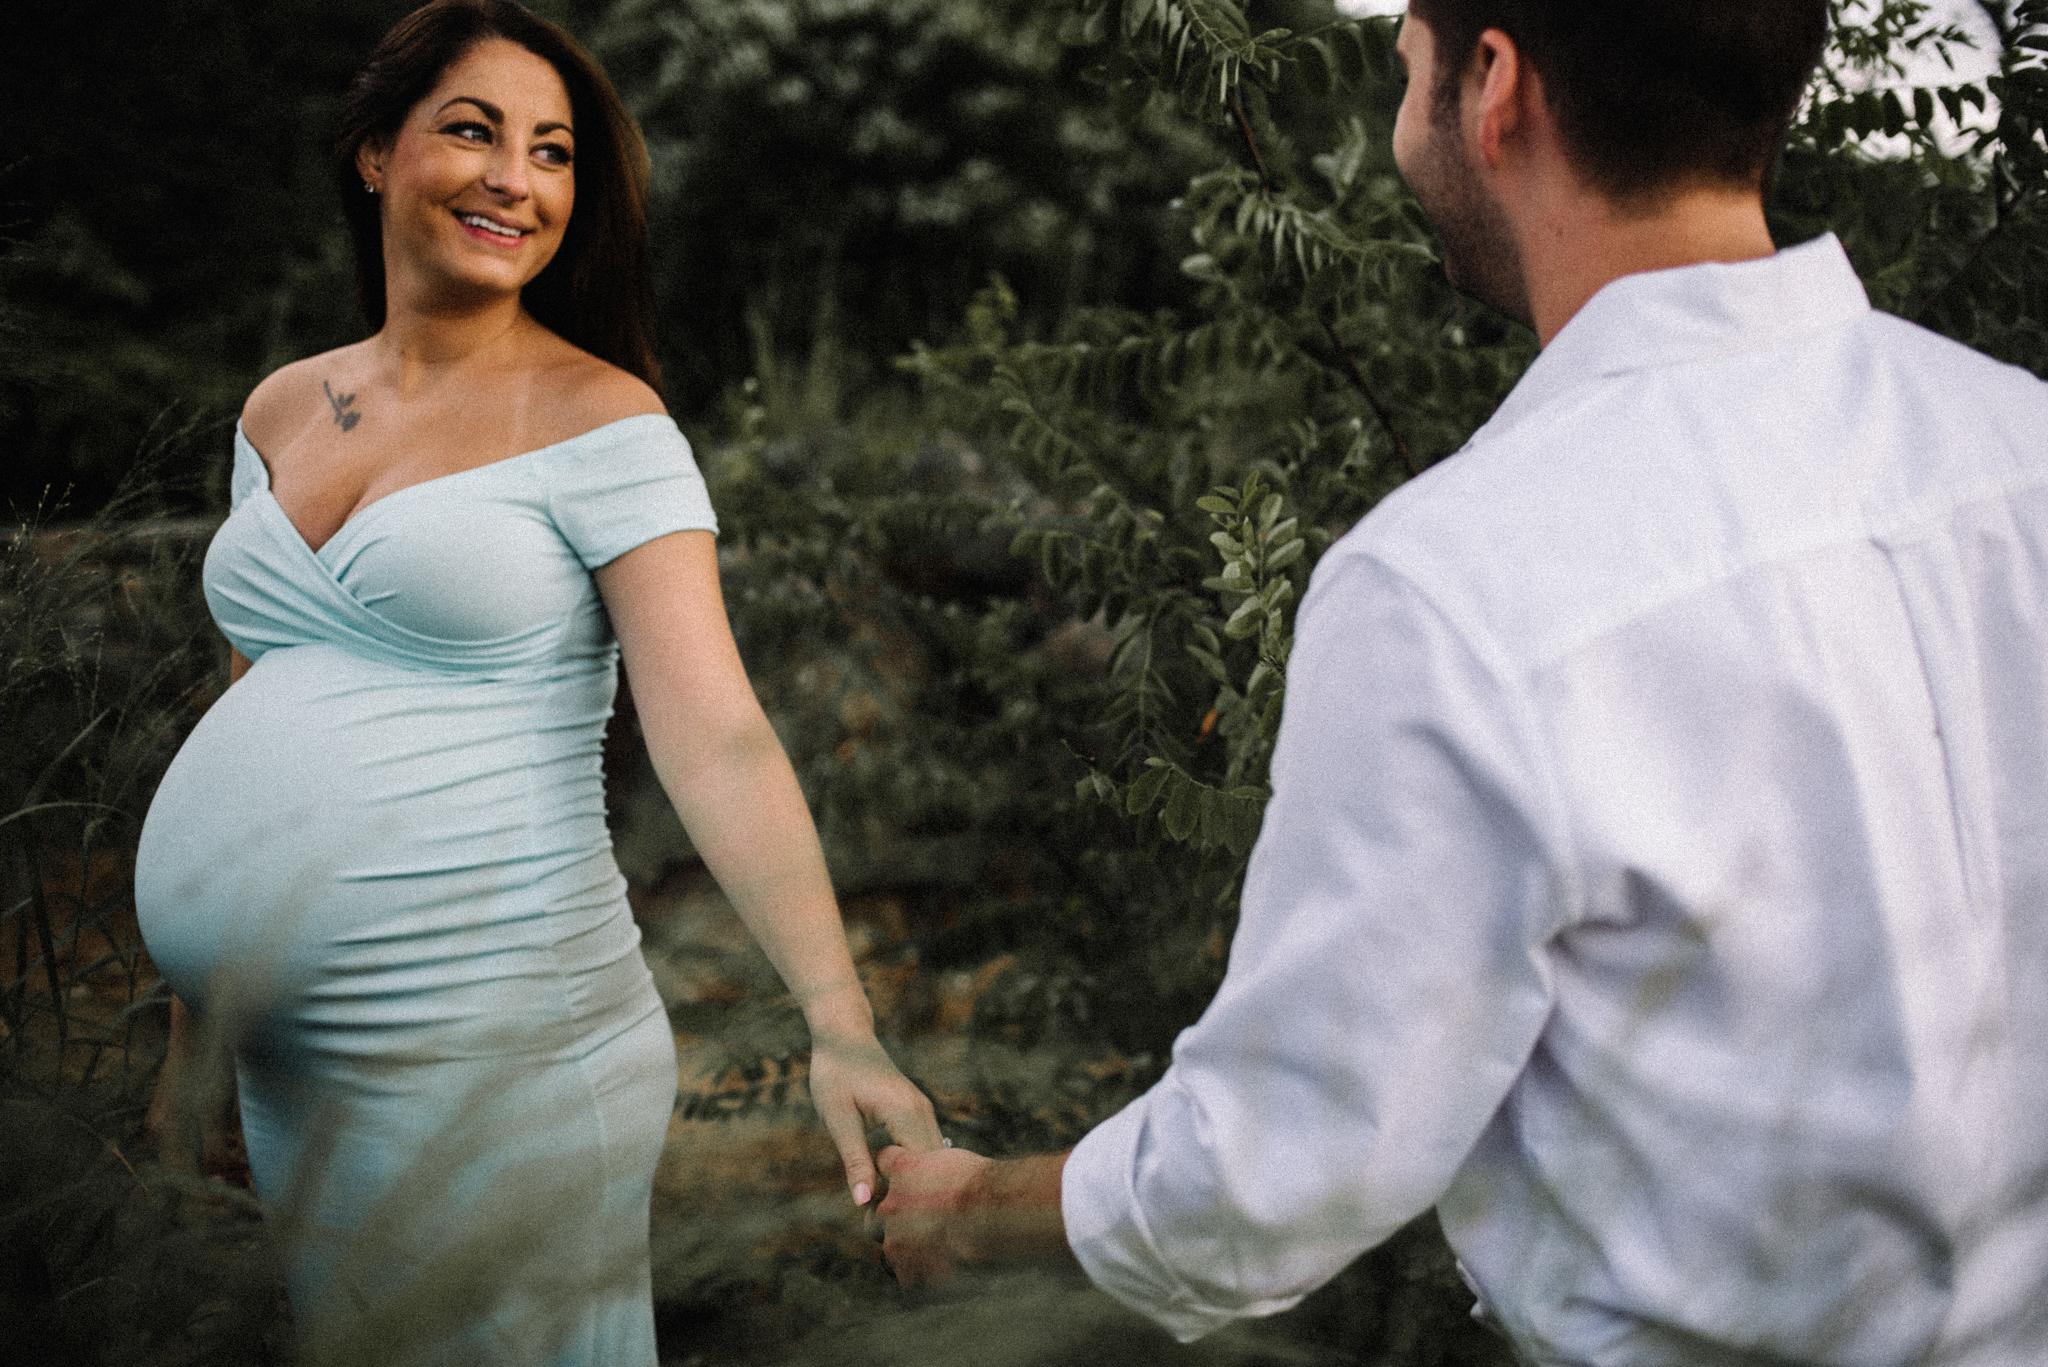 Mandy Spencer Maternity Sunrise Session Shenandoah National Park - White Sails Photography Creative_12.JPG